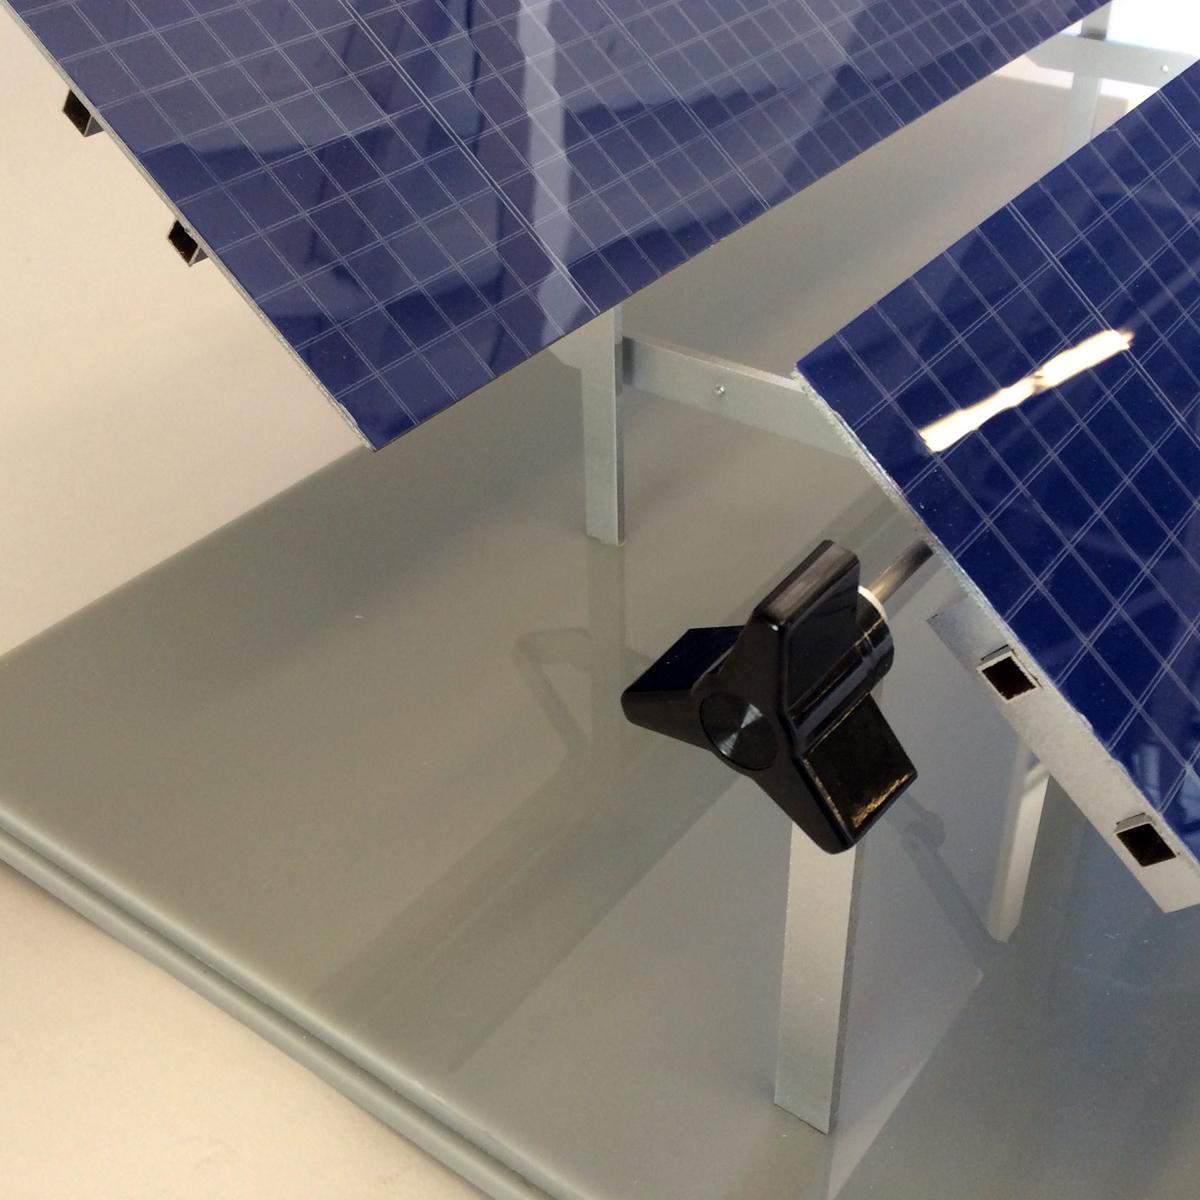 Sunlink Solar tilt display